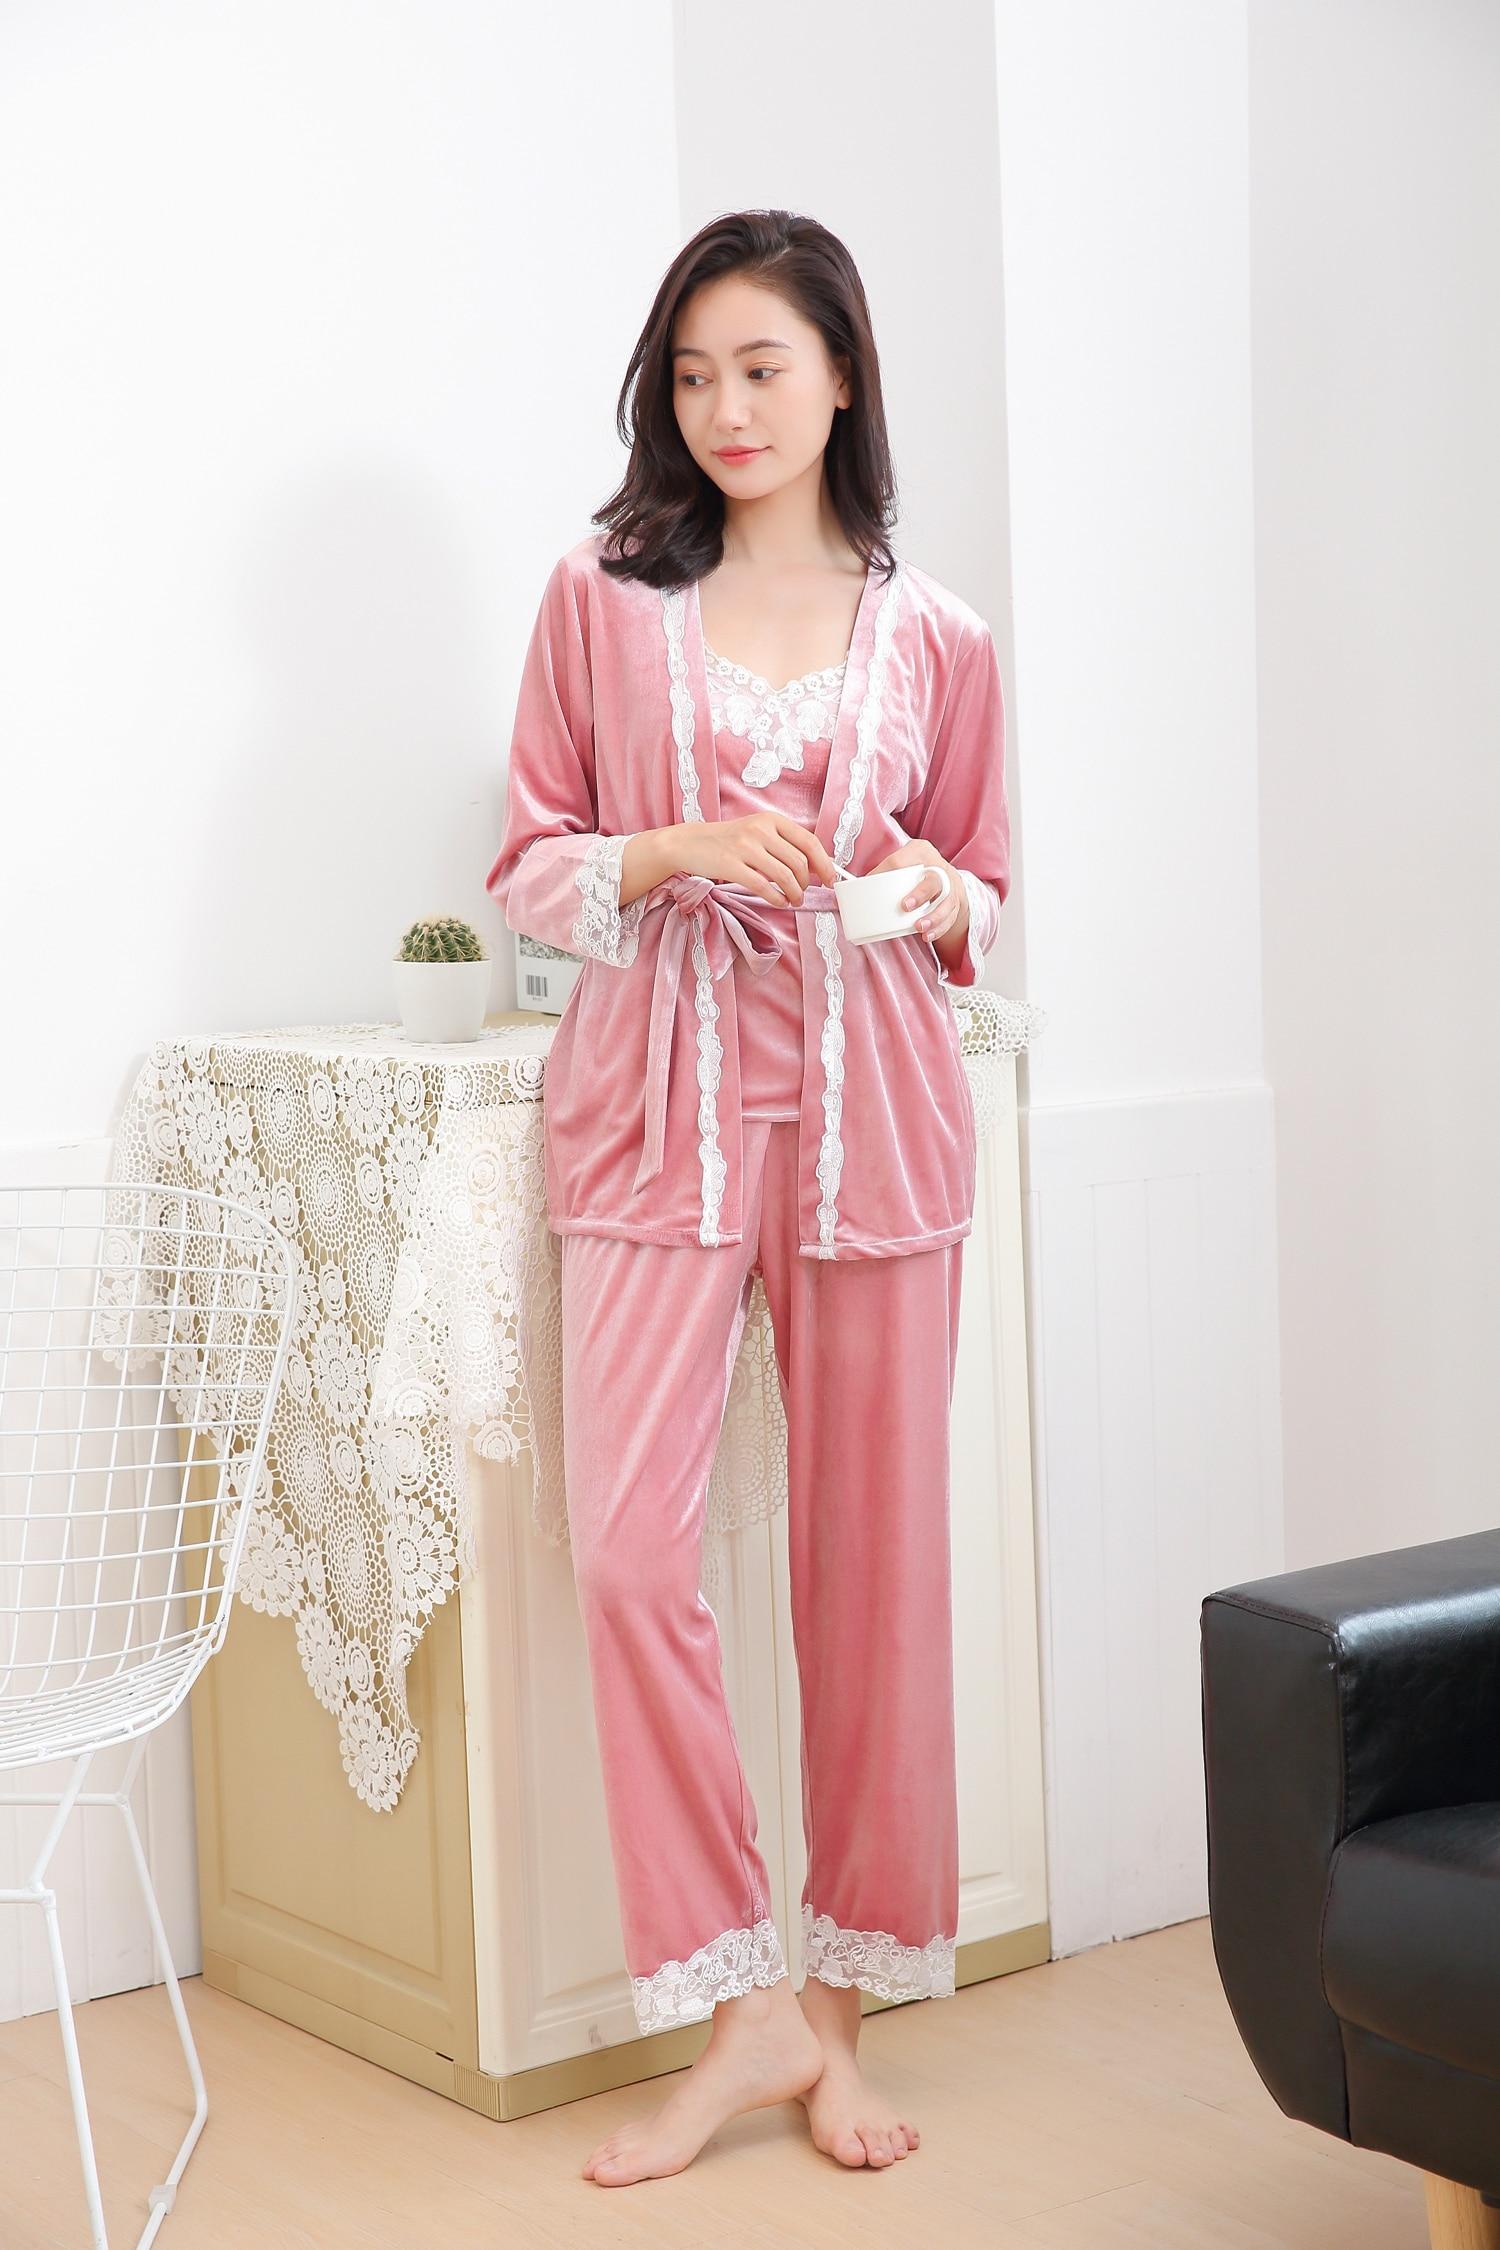 men swefluf comfortable pajamas zoom flannel sleep loading for comforter